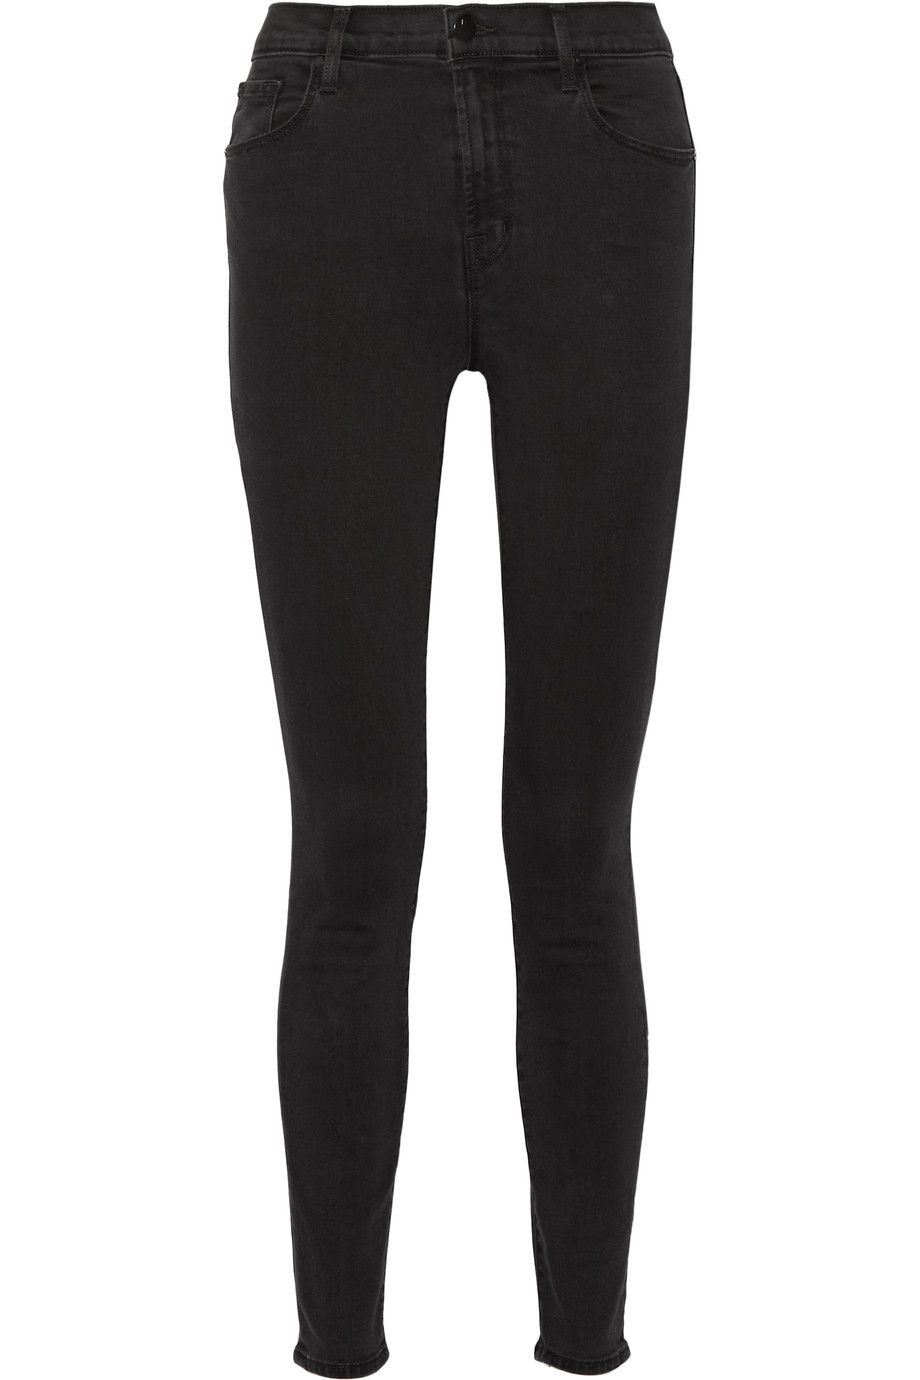 J BRAND . #jbrand #cloth #jeans